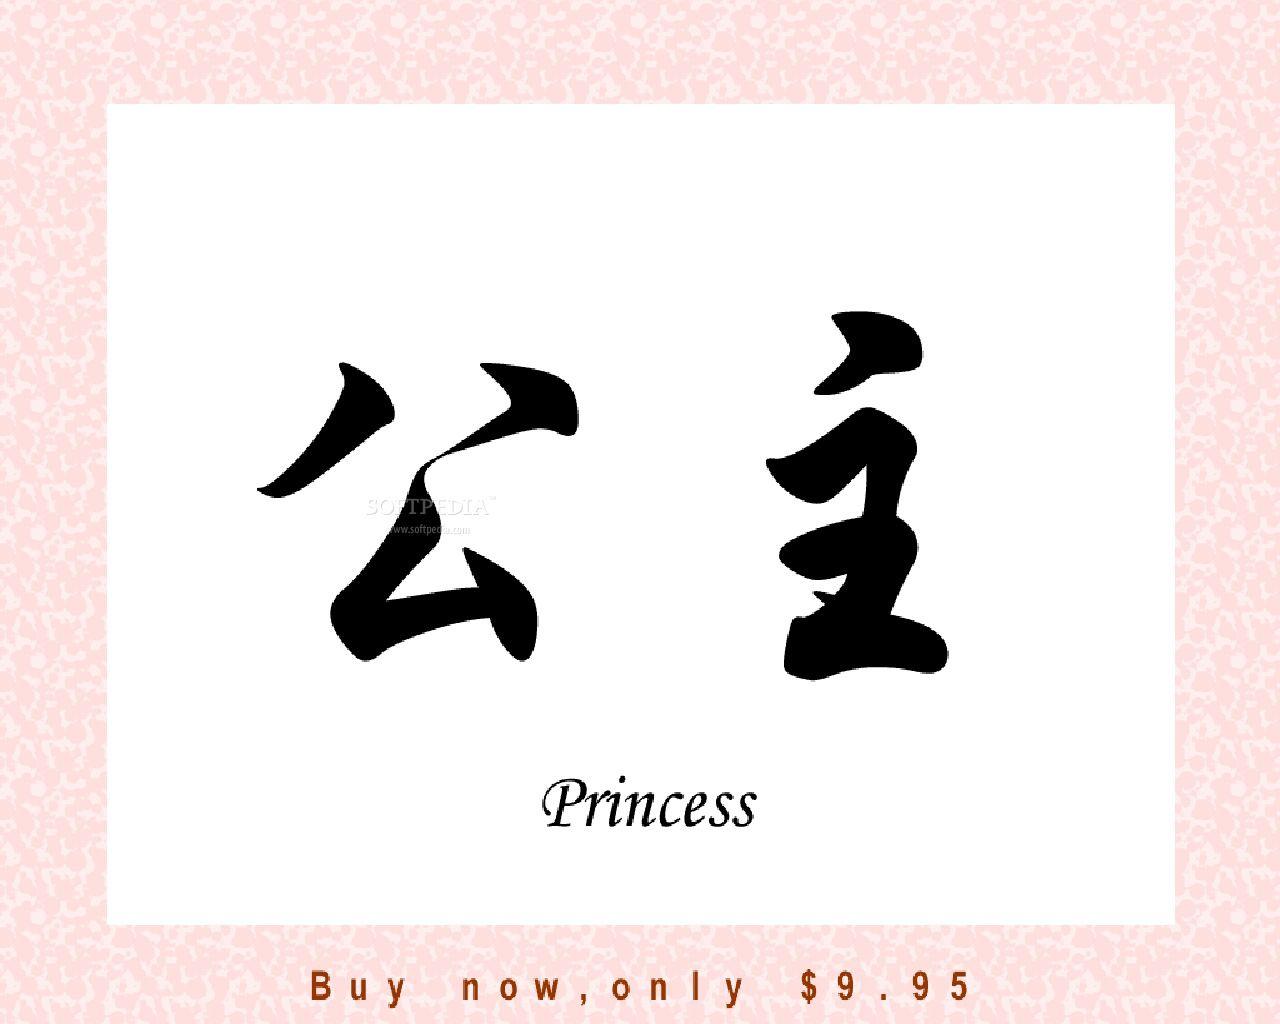 Chinese Symbols Chinese Symbols For Words Chinese Symbols